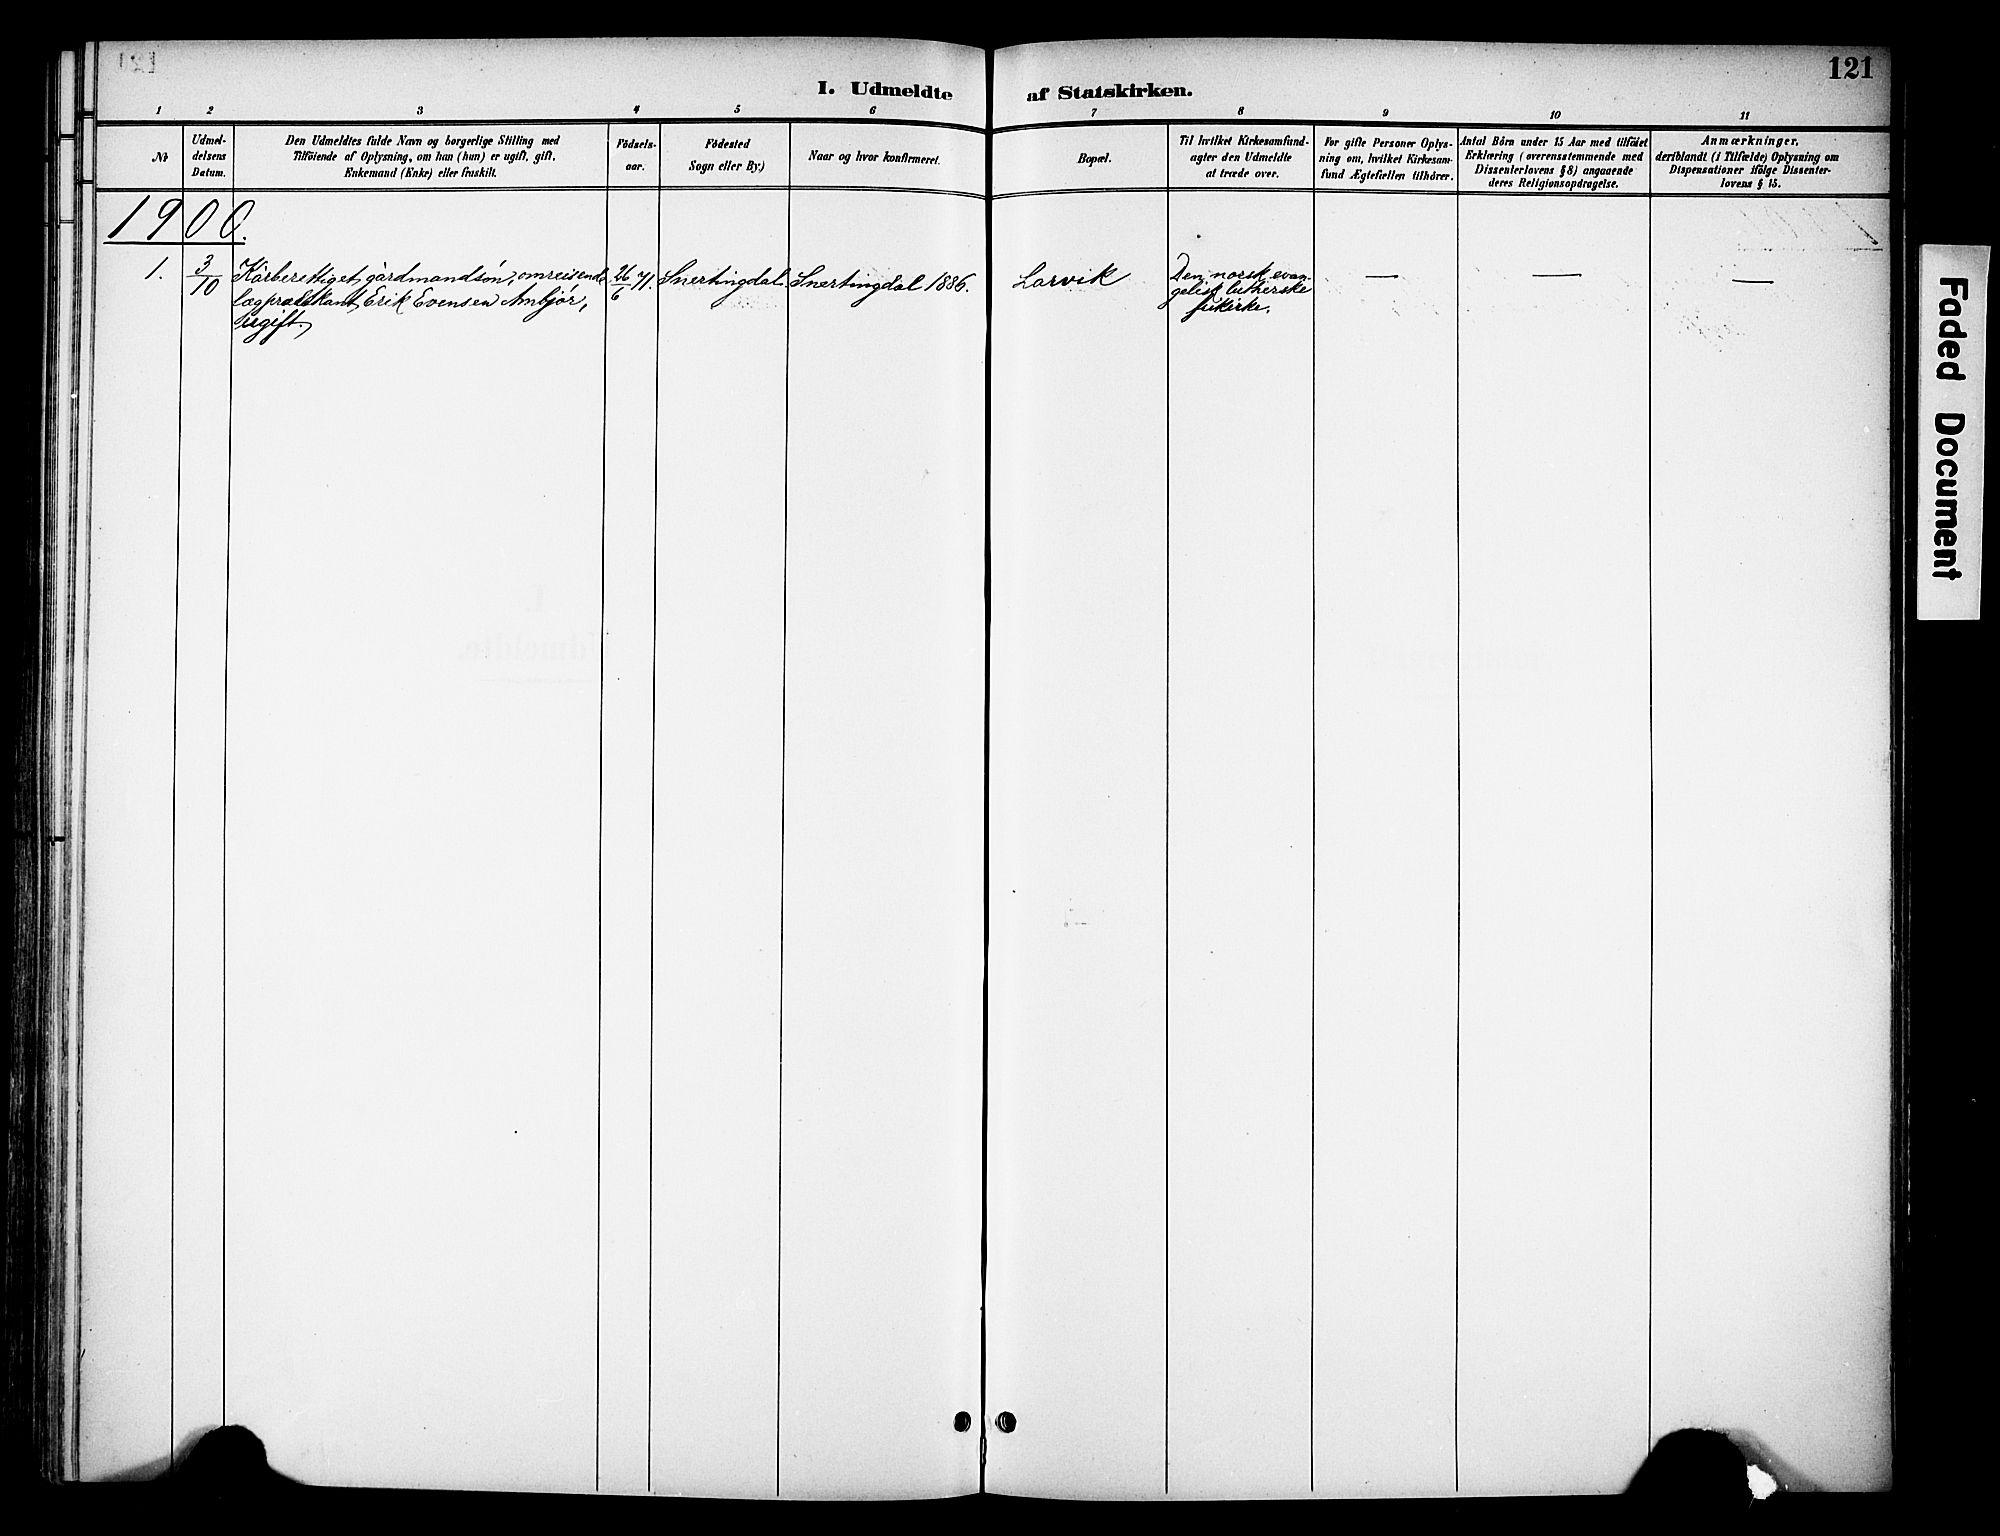 SAH, Biri prestekontor, Ministerialbok nr. 8, 1894-1901, s. 121